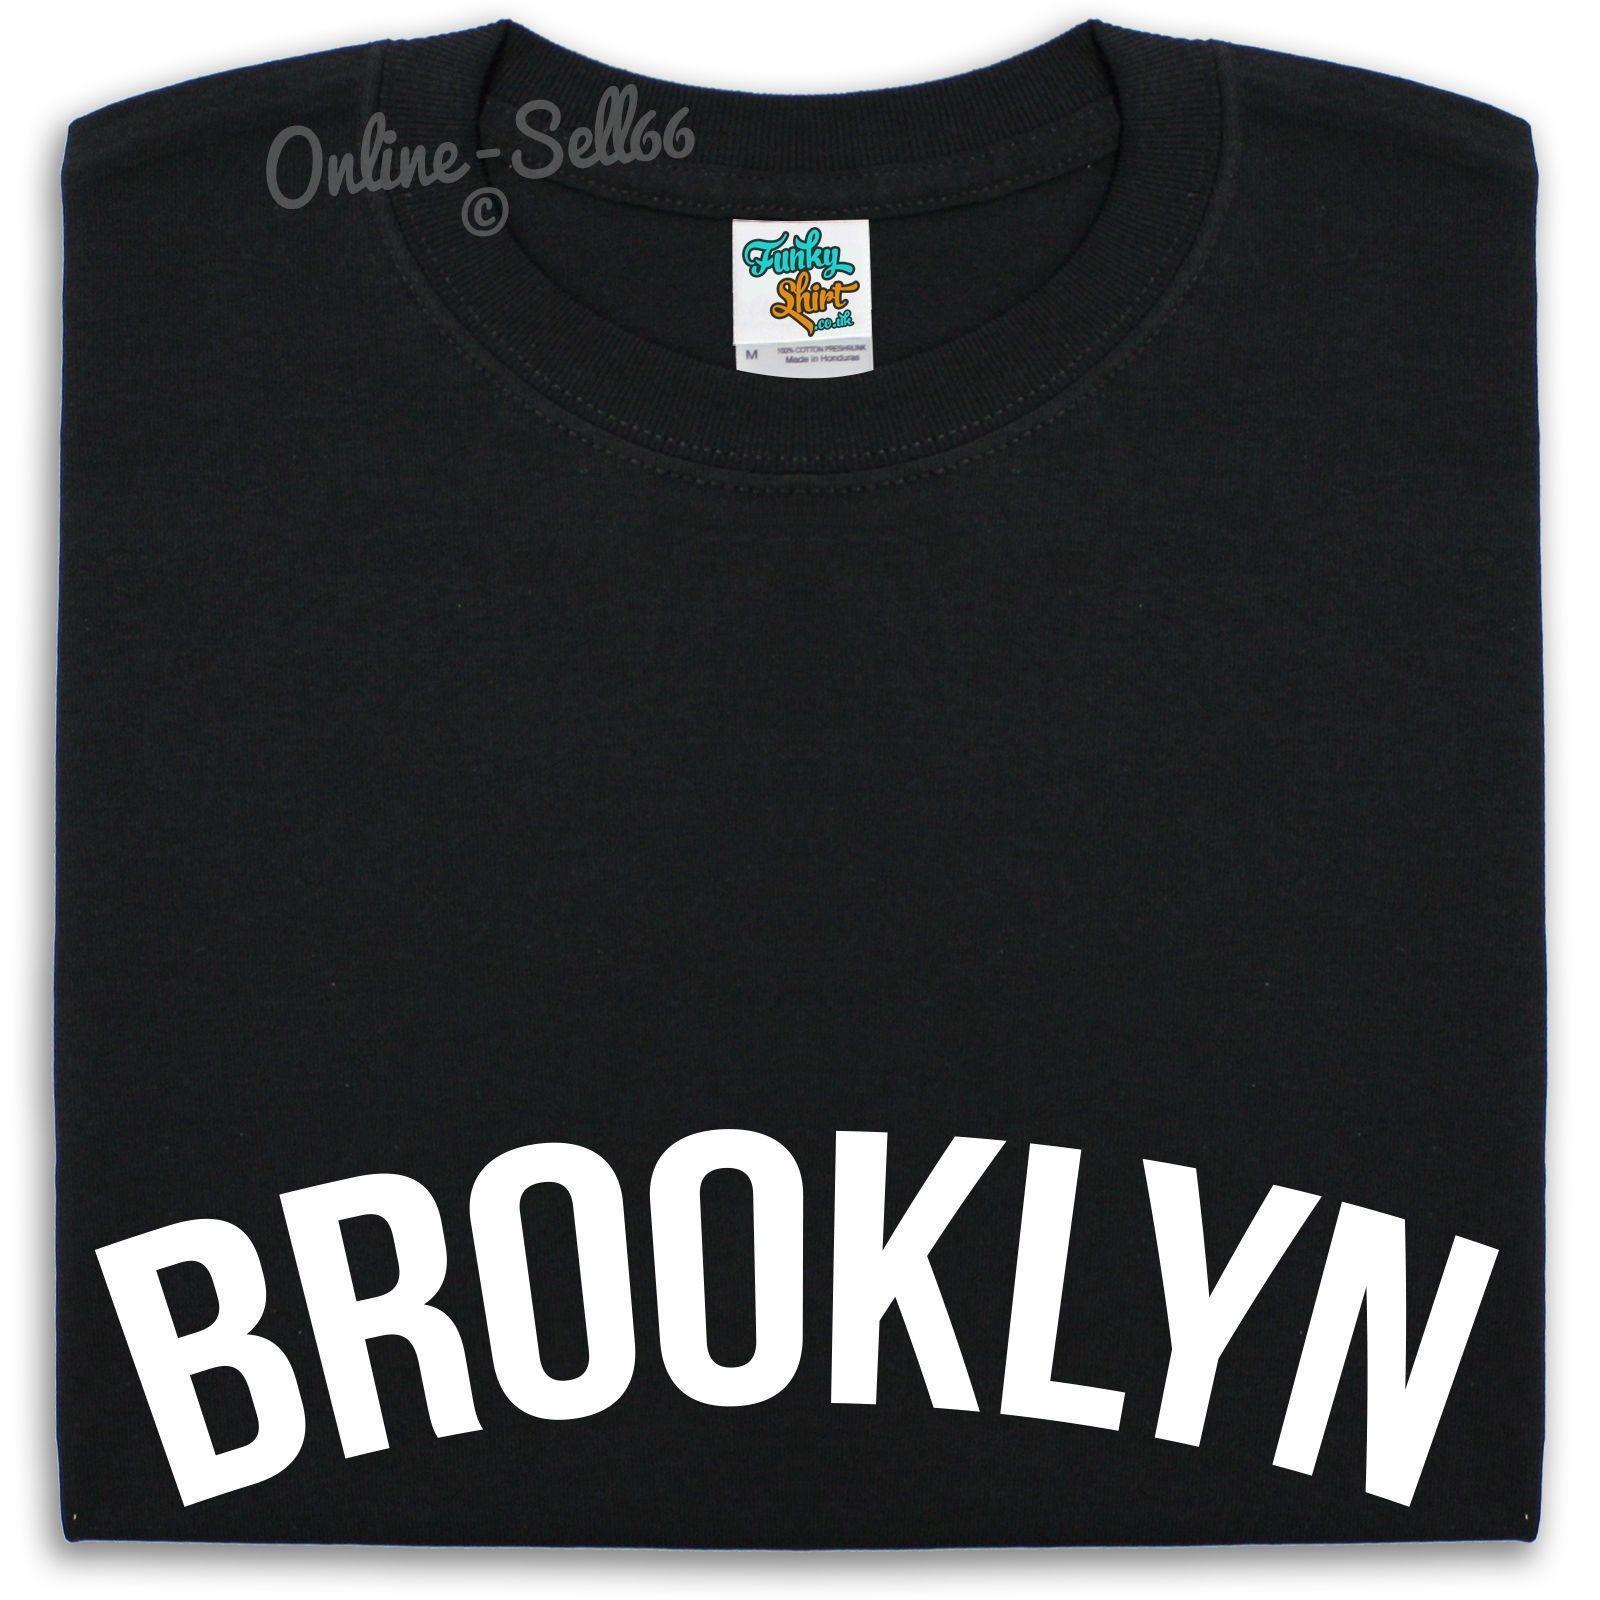 2f2d072c8 Brooklyn T Shirt Men Women Kids New York Nyc Cool Casual Pride T Shirt Men  Unisex New Fashion Tshirt T Shirts Very Funny T Shirts From Cls6688522, ...